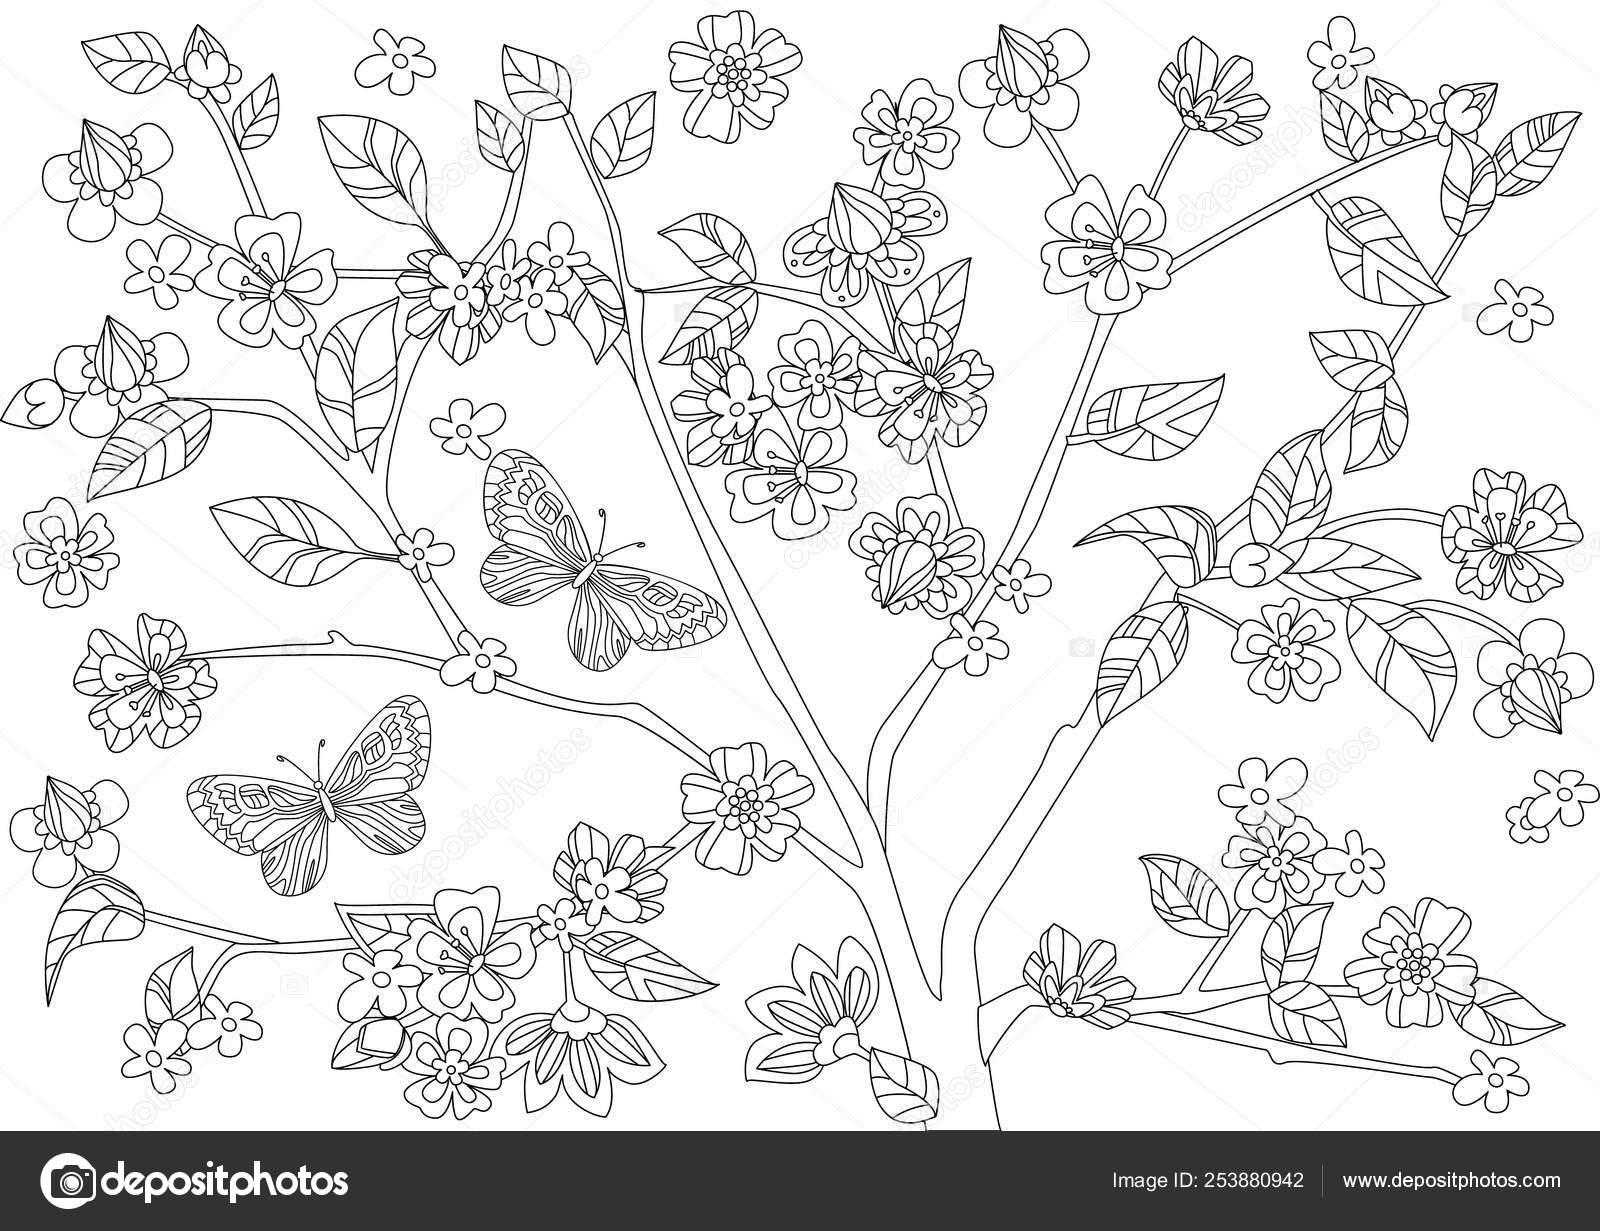 Kiraz Resmi Boyama Sayfasi Coloring Free To Print